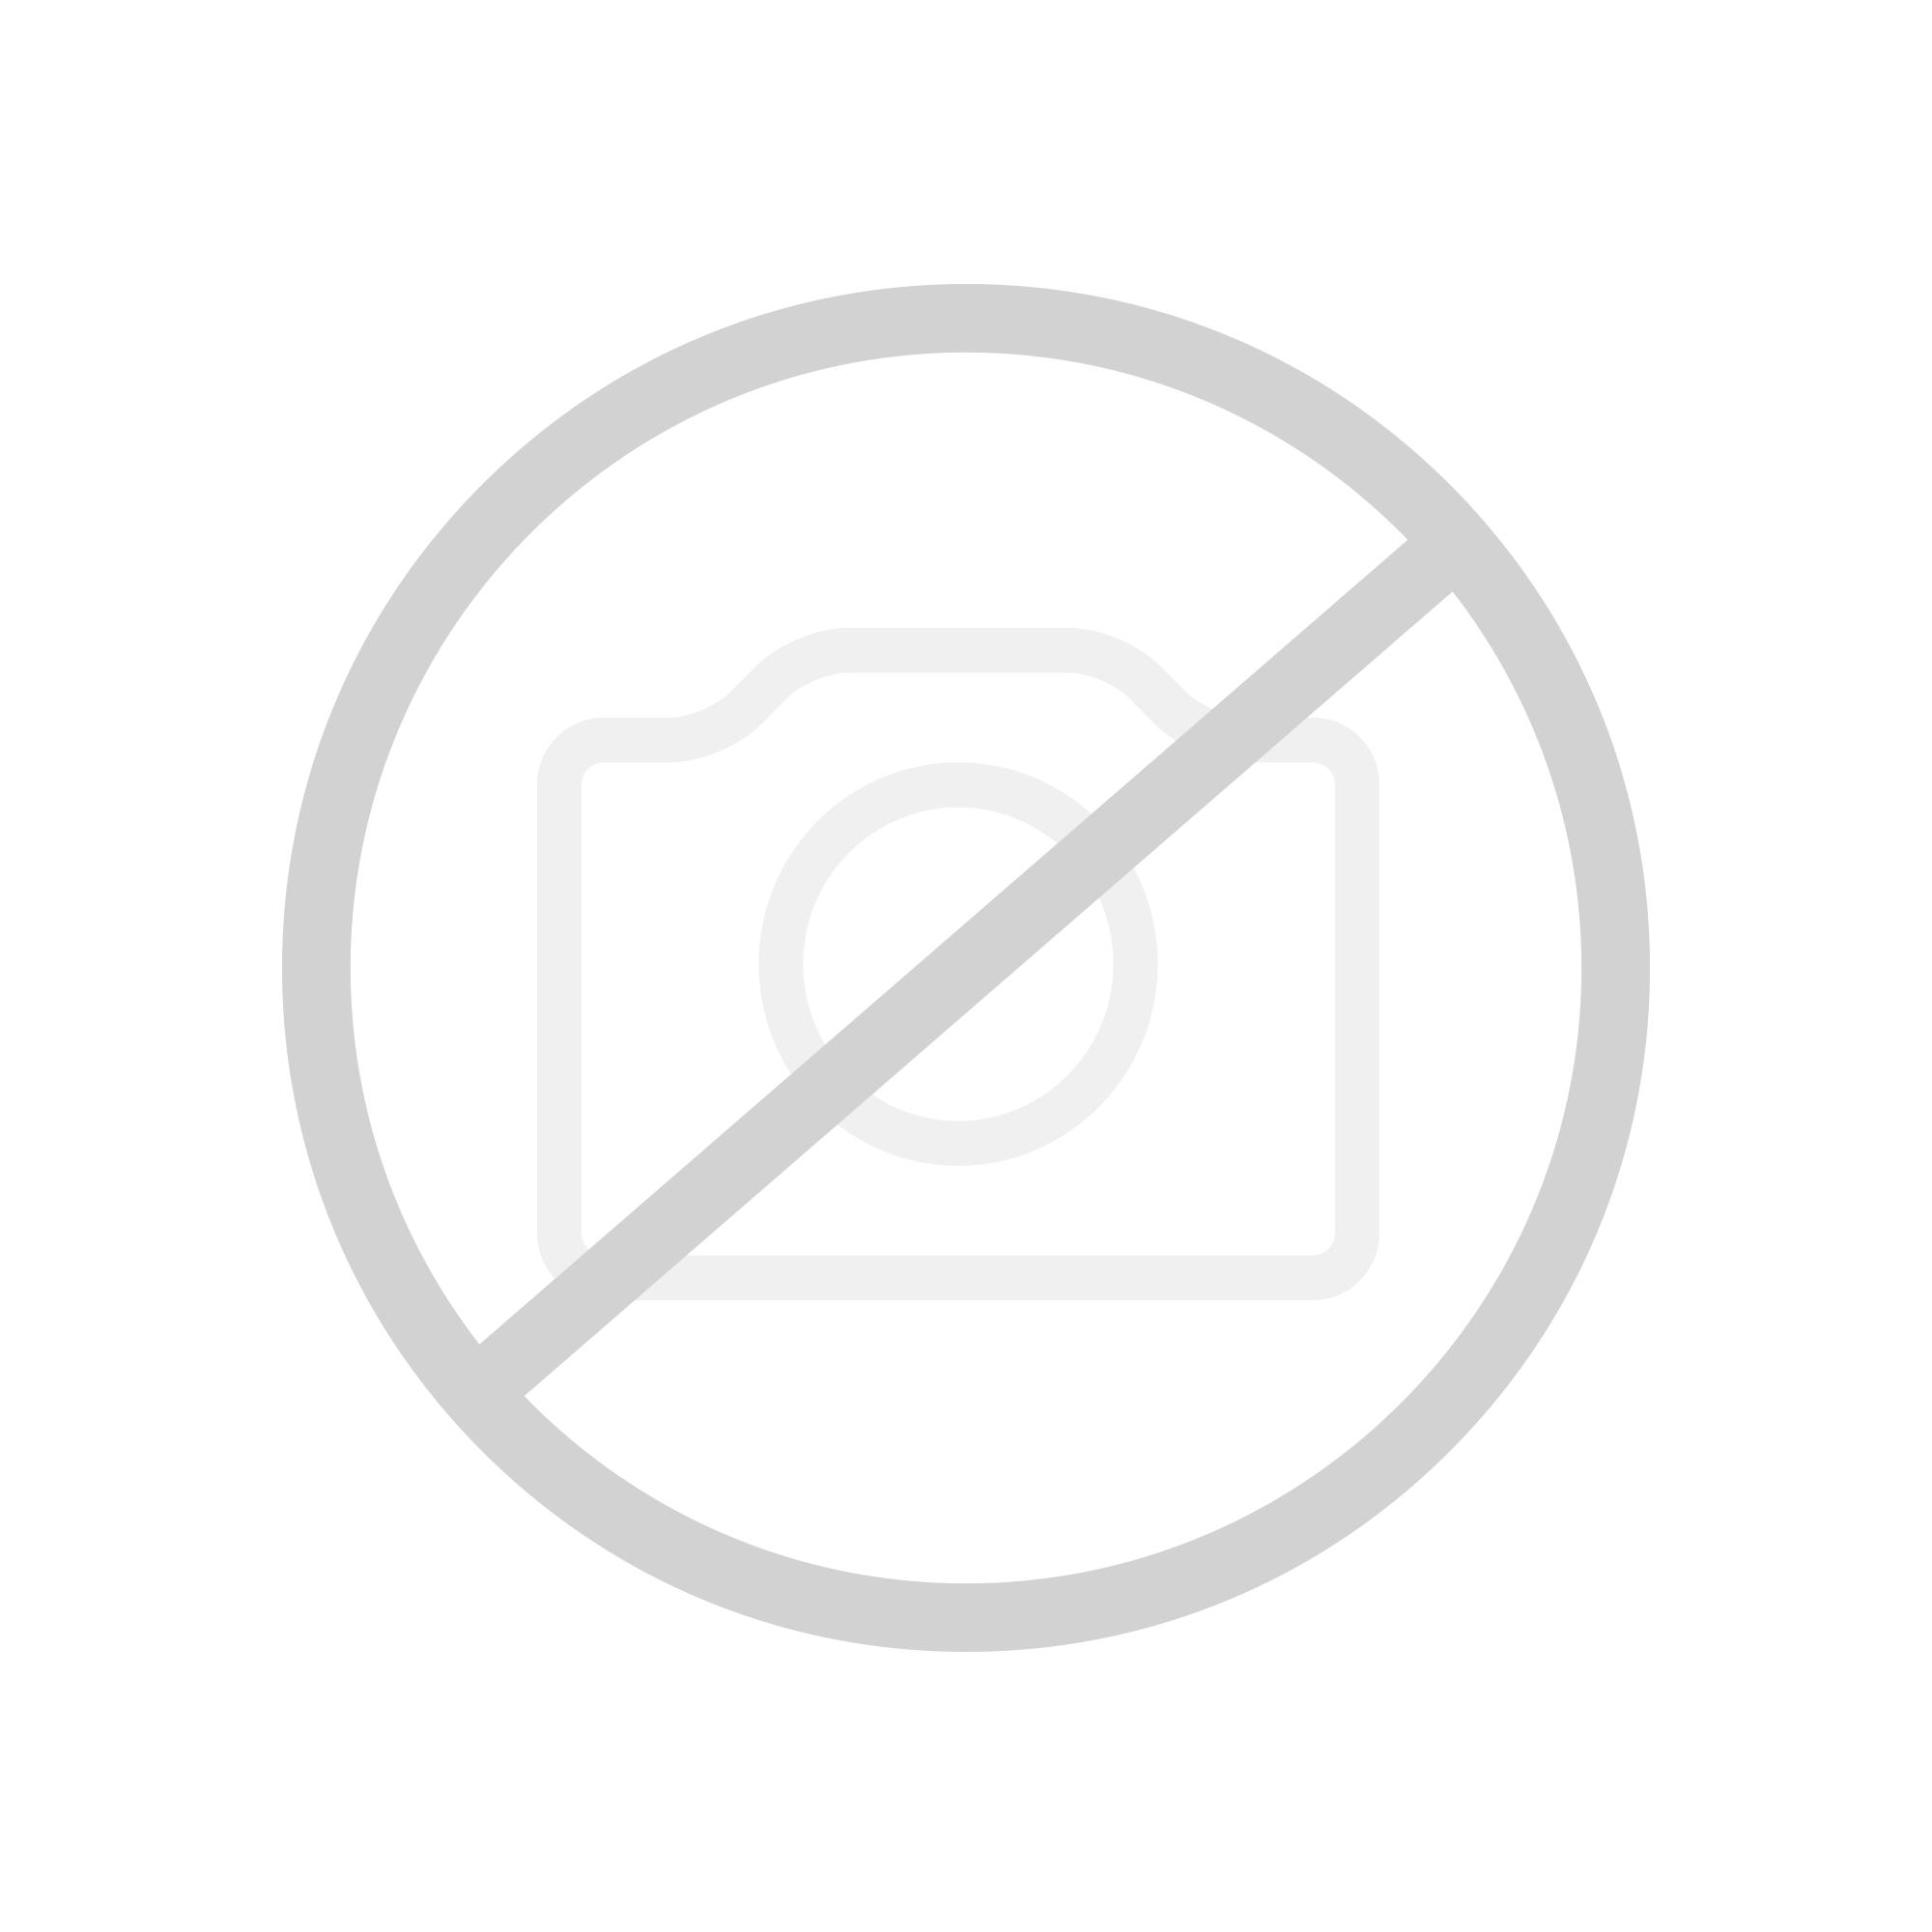 Kaldewei Nobler Purismus Ambiente Kollektion Badewannengriff Typ B